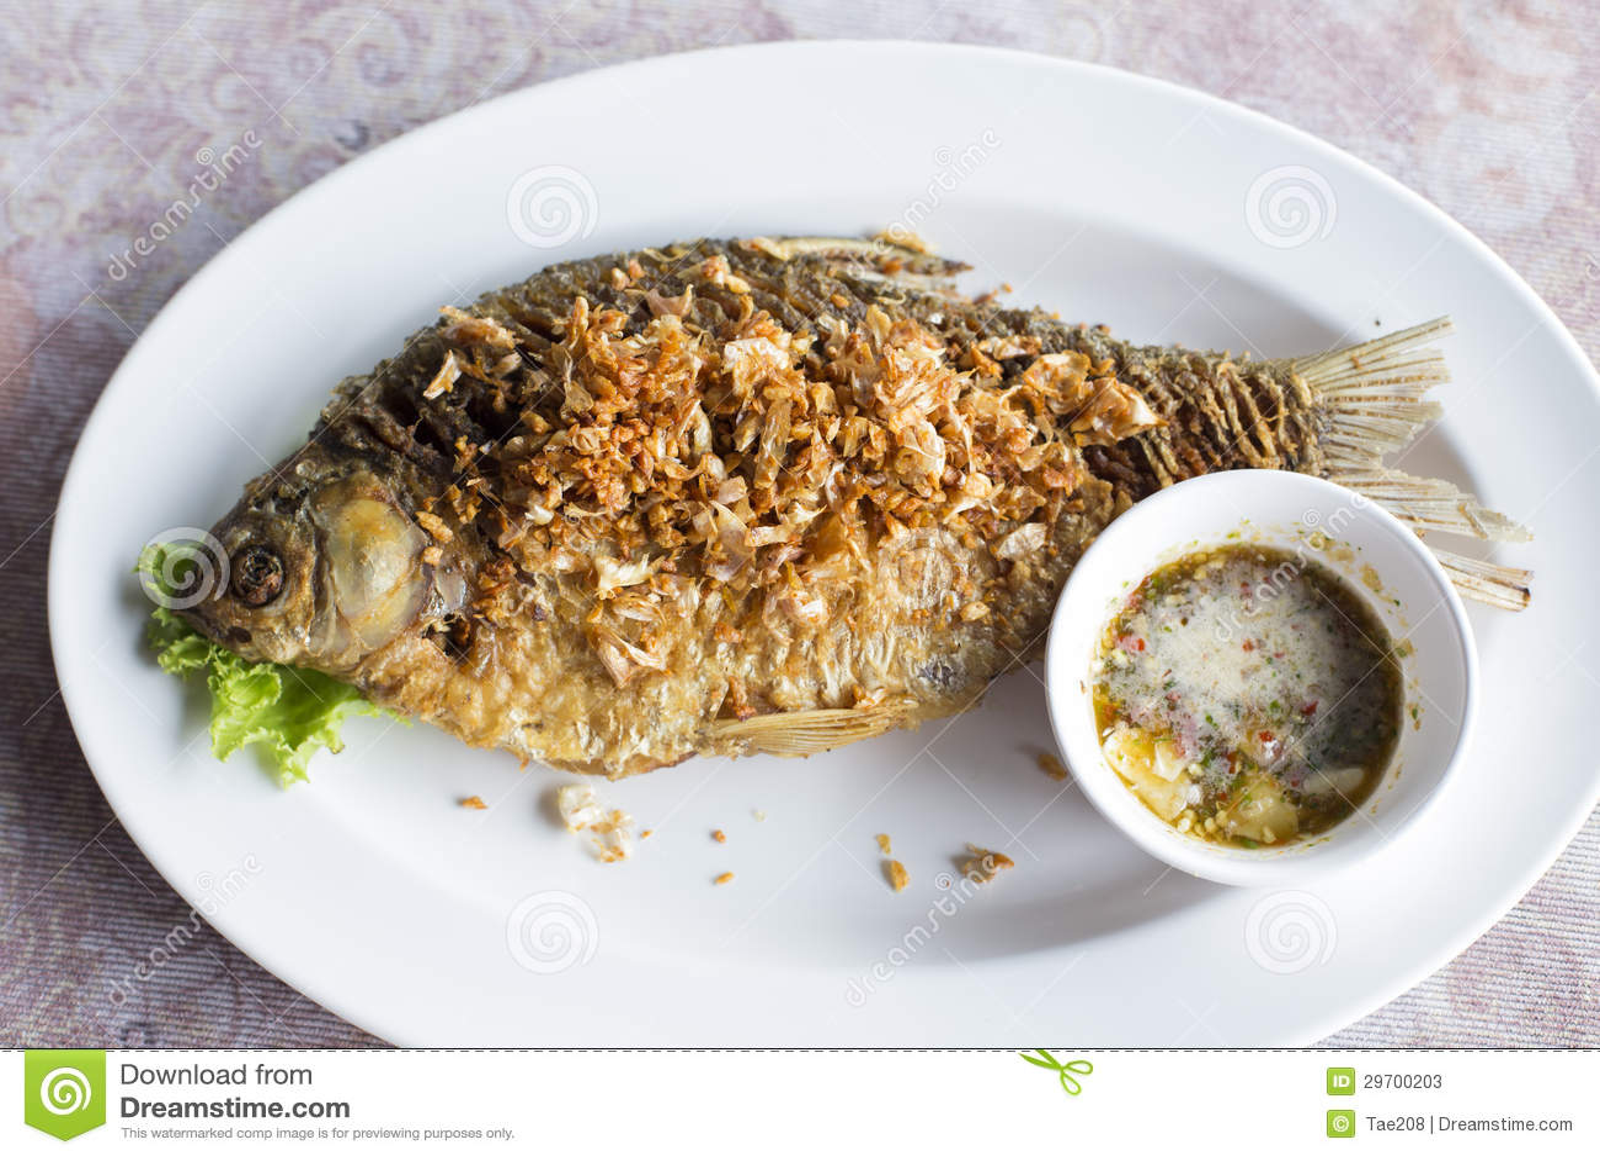 Deep fried java barb fish with garlic stock photos image for Garlic sauce for fish